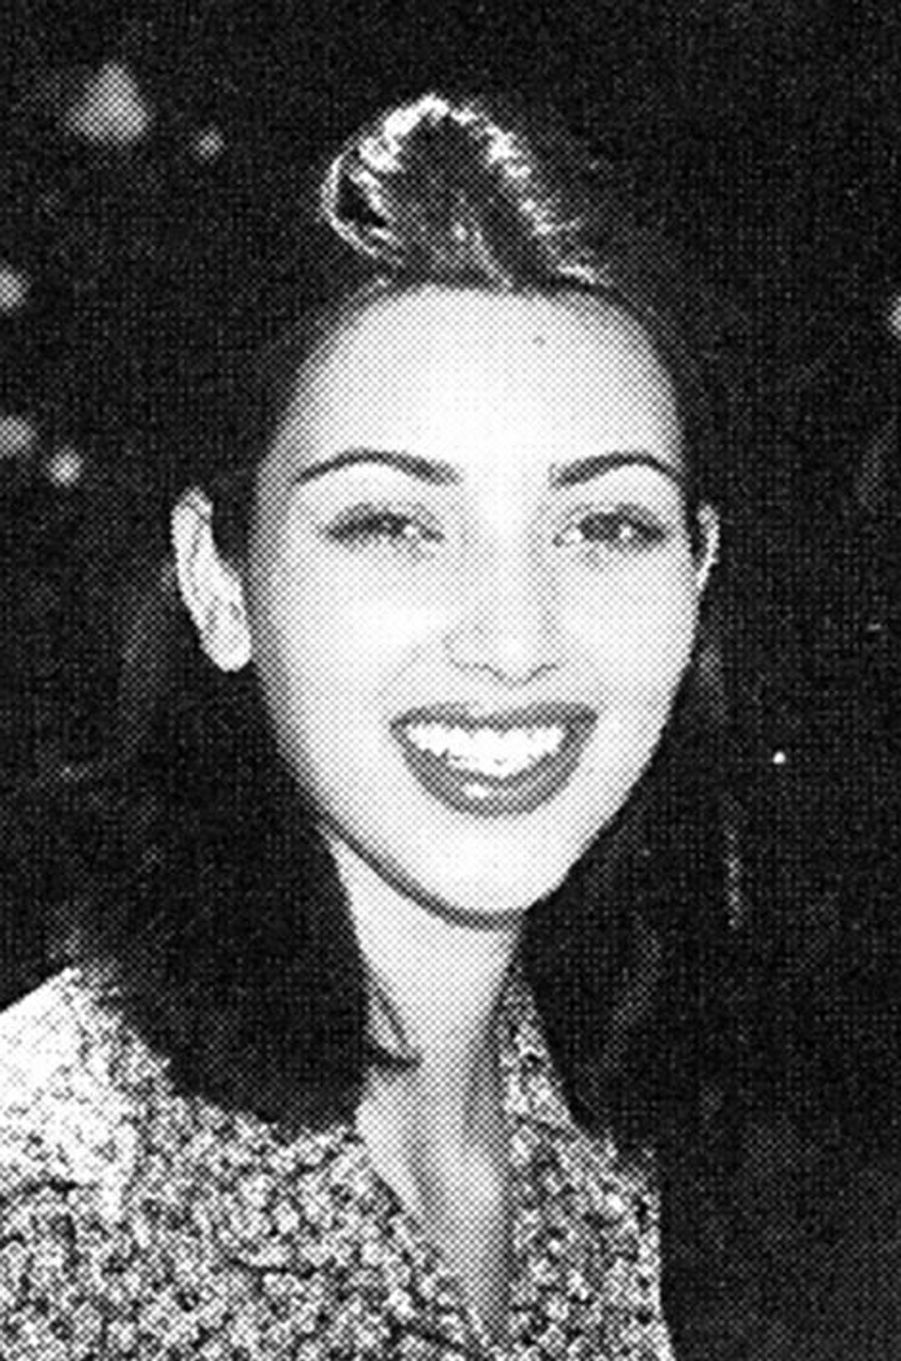 En 1996